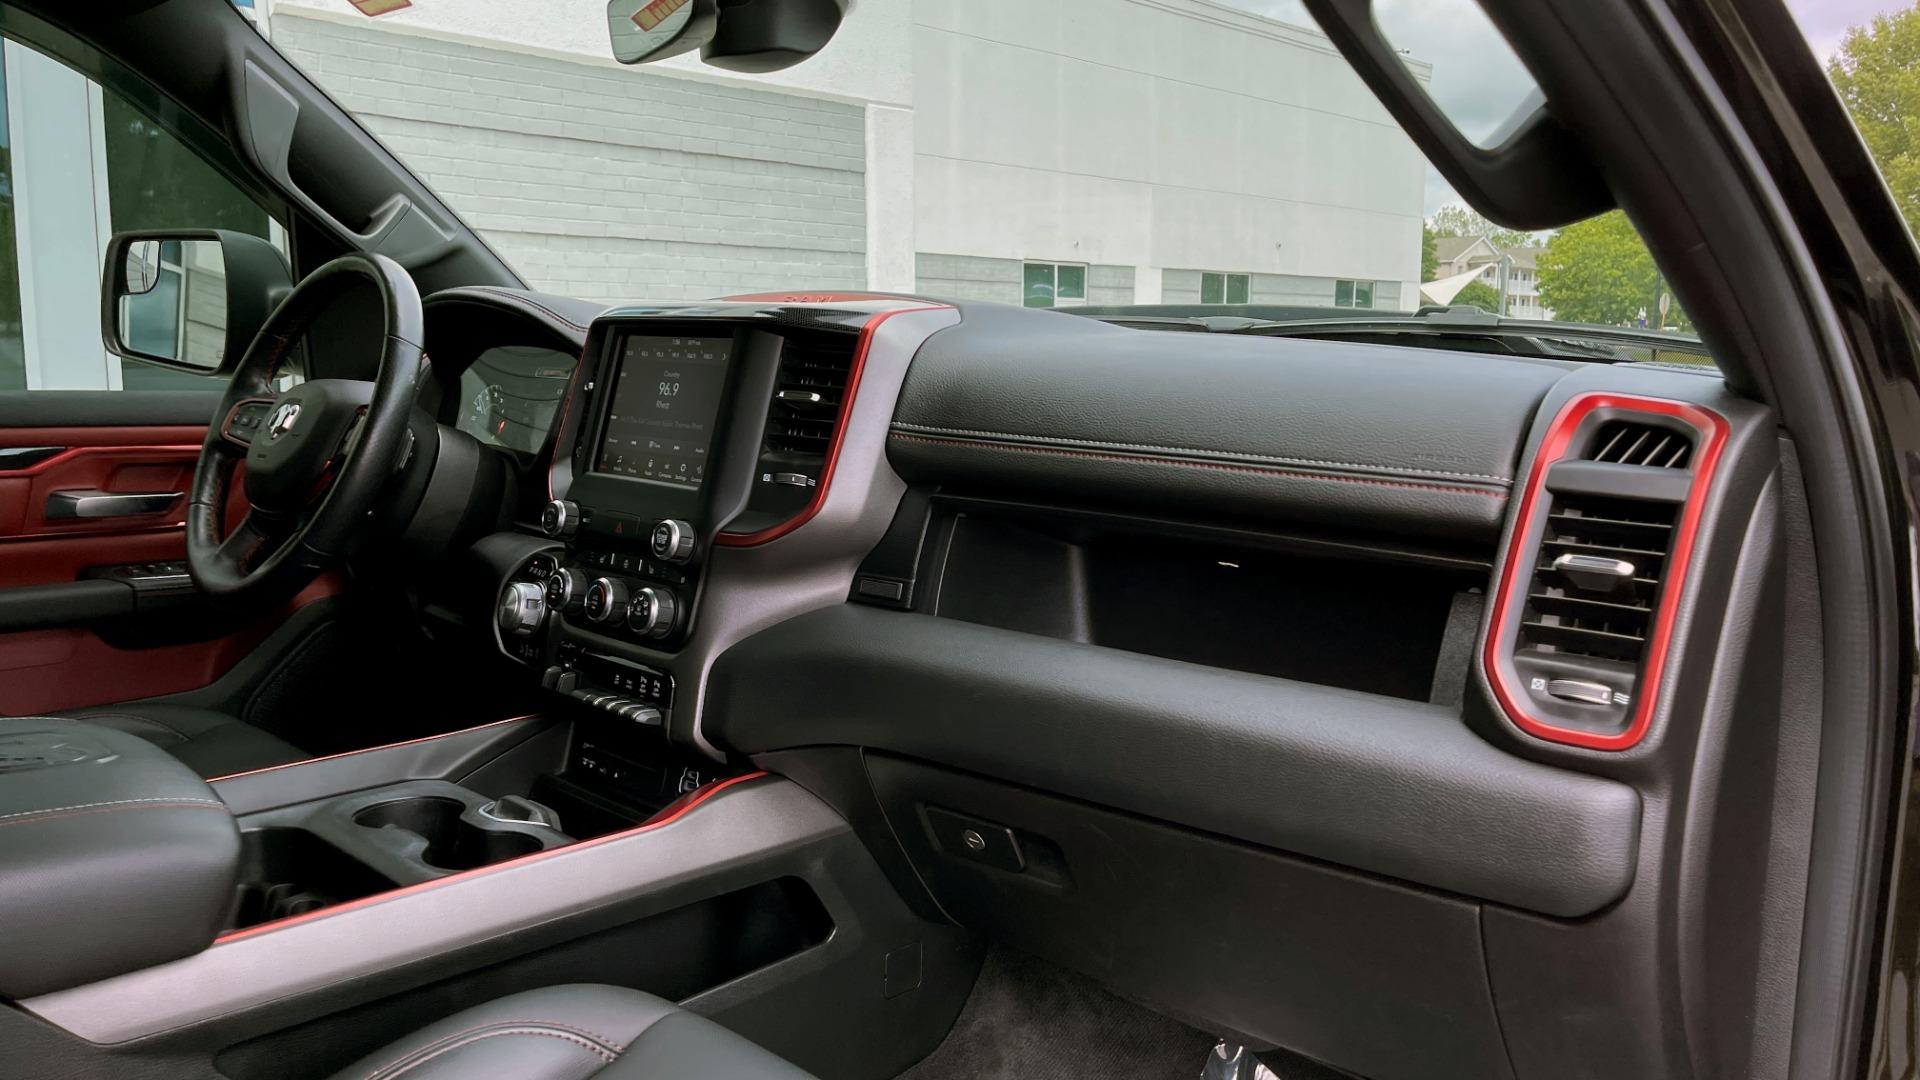 Used 2019 Ram 1500 REBEL QUADCAB 4X4 / 5.7L HEMI / 8-SPD AUTO / REMOTE START / PARK ASSIST for sale $44,495 at Formula Imports in Charlotte NC 28227 65